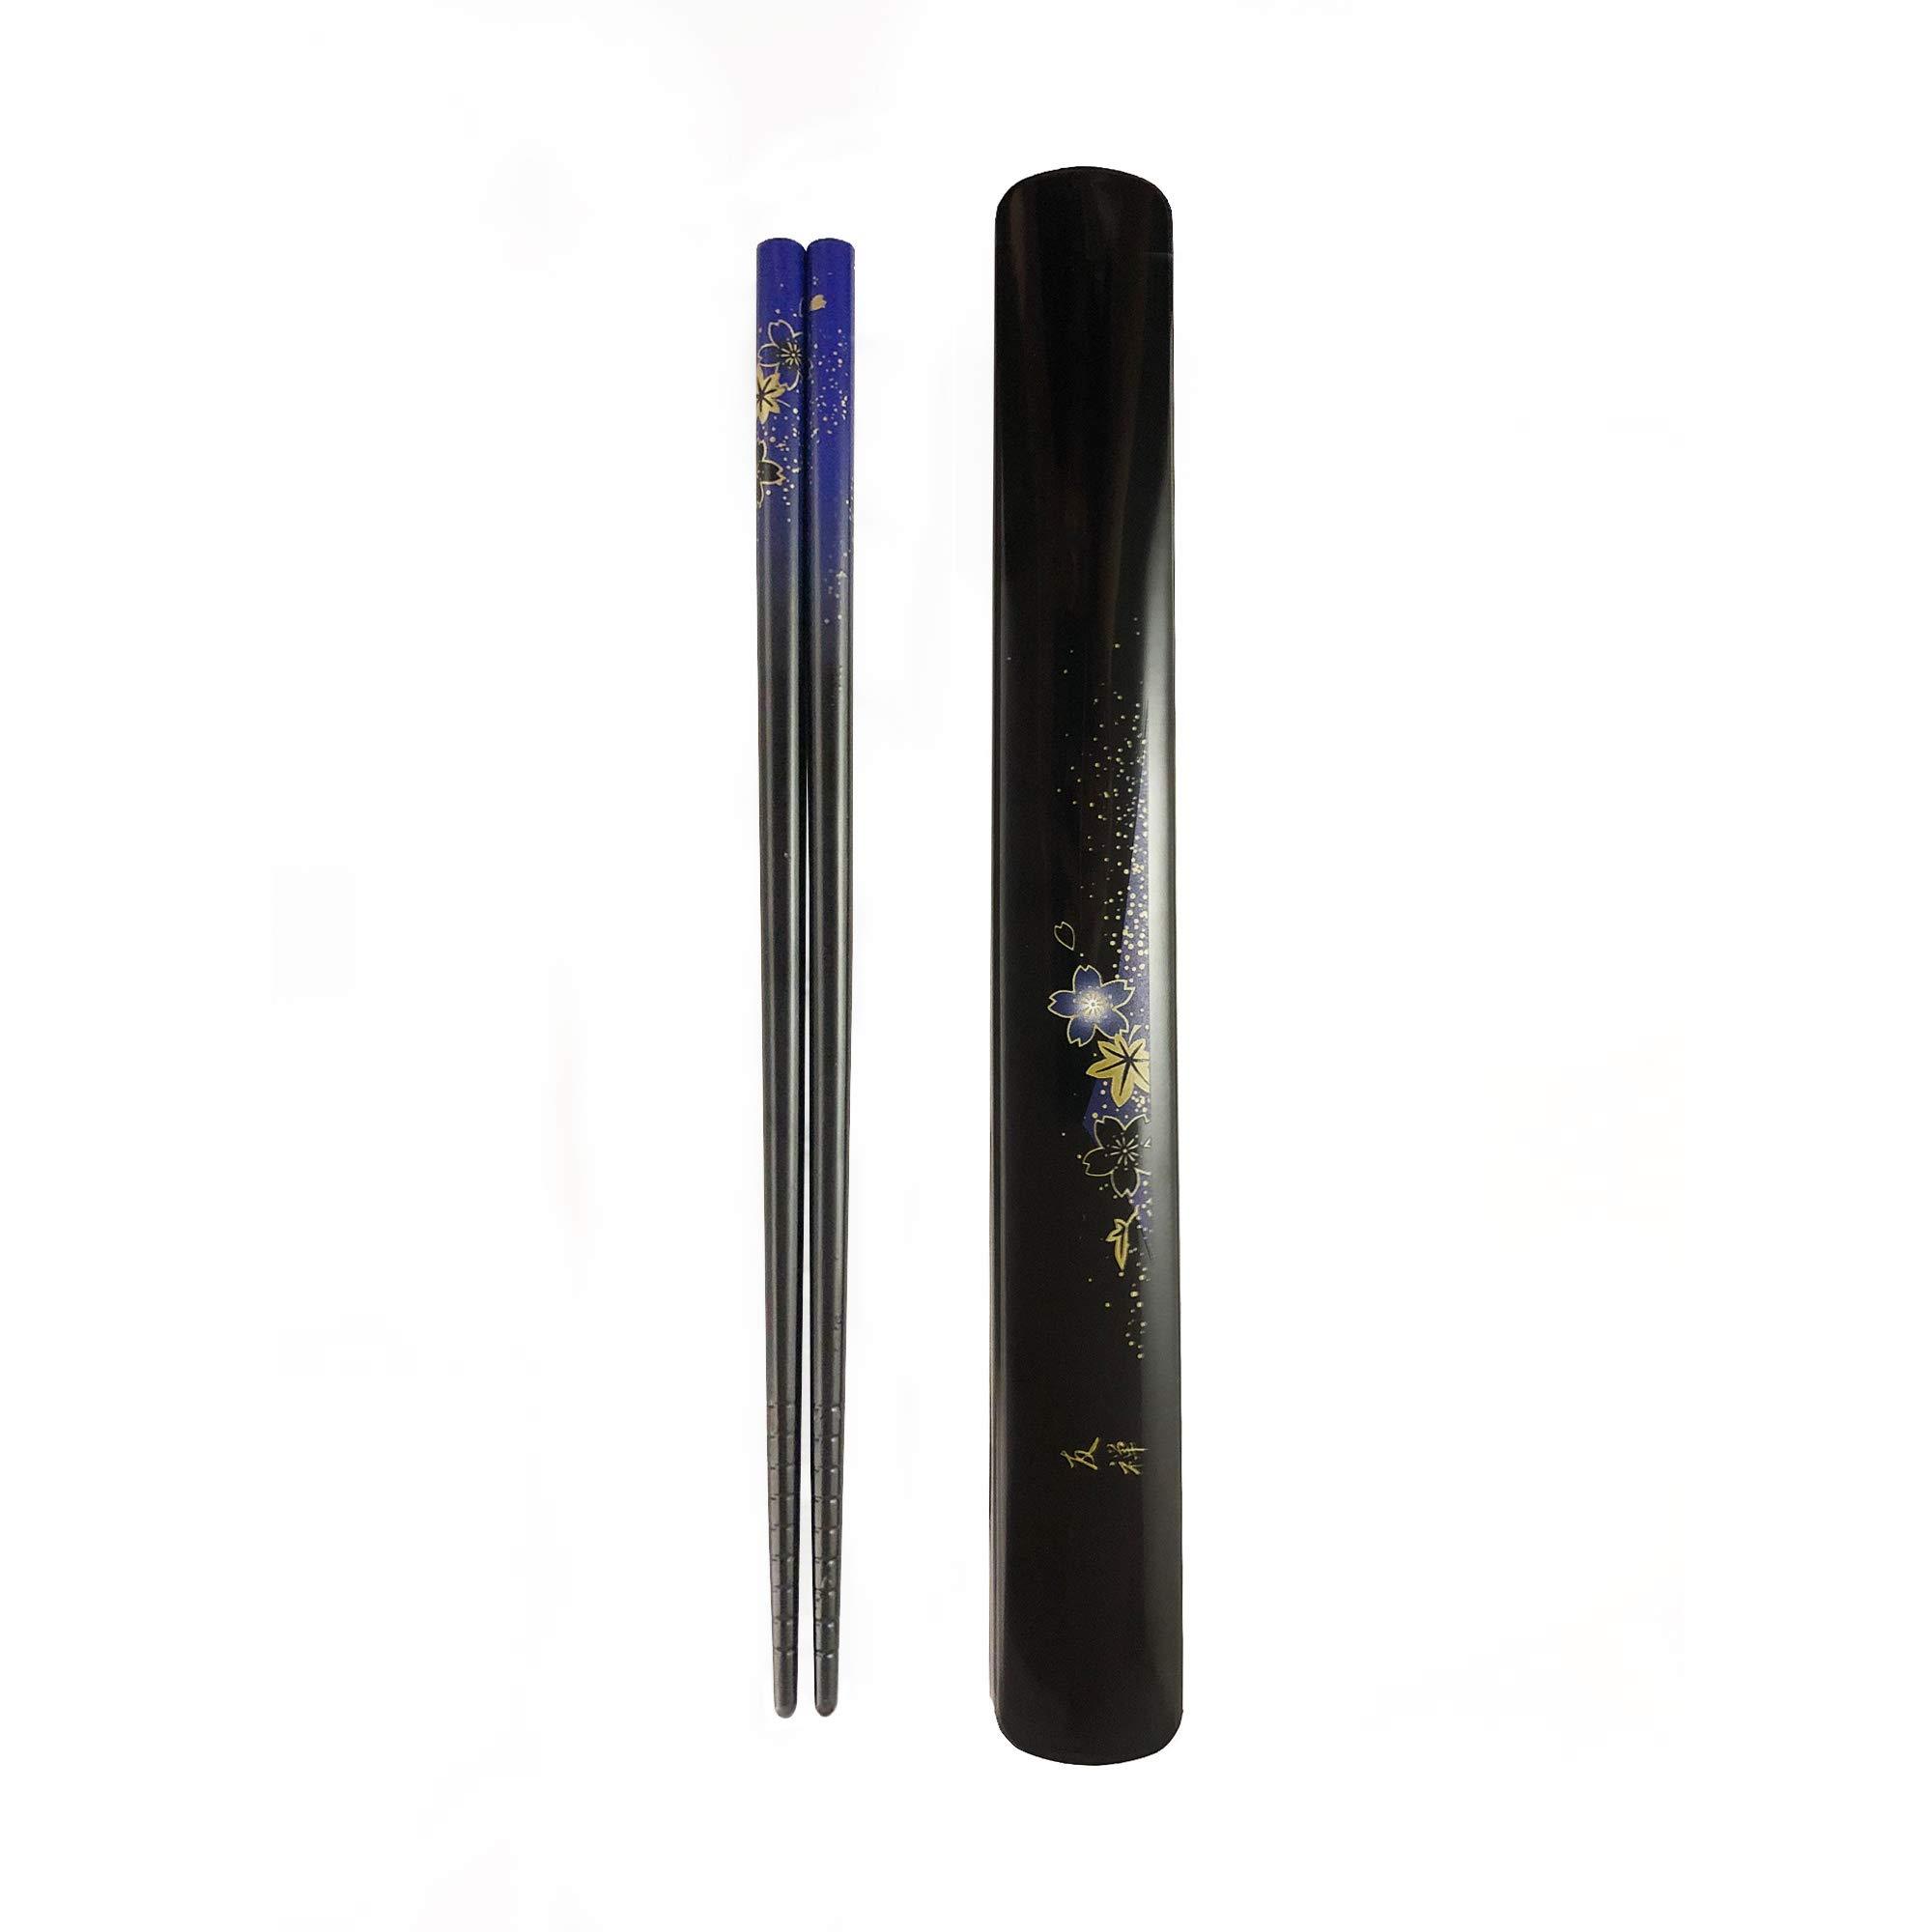 Portable and Dishwasher Safe Blue Youda Chopsticks Reusable Japanese Natural Wood Chopsticks 1 Pair with Case